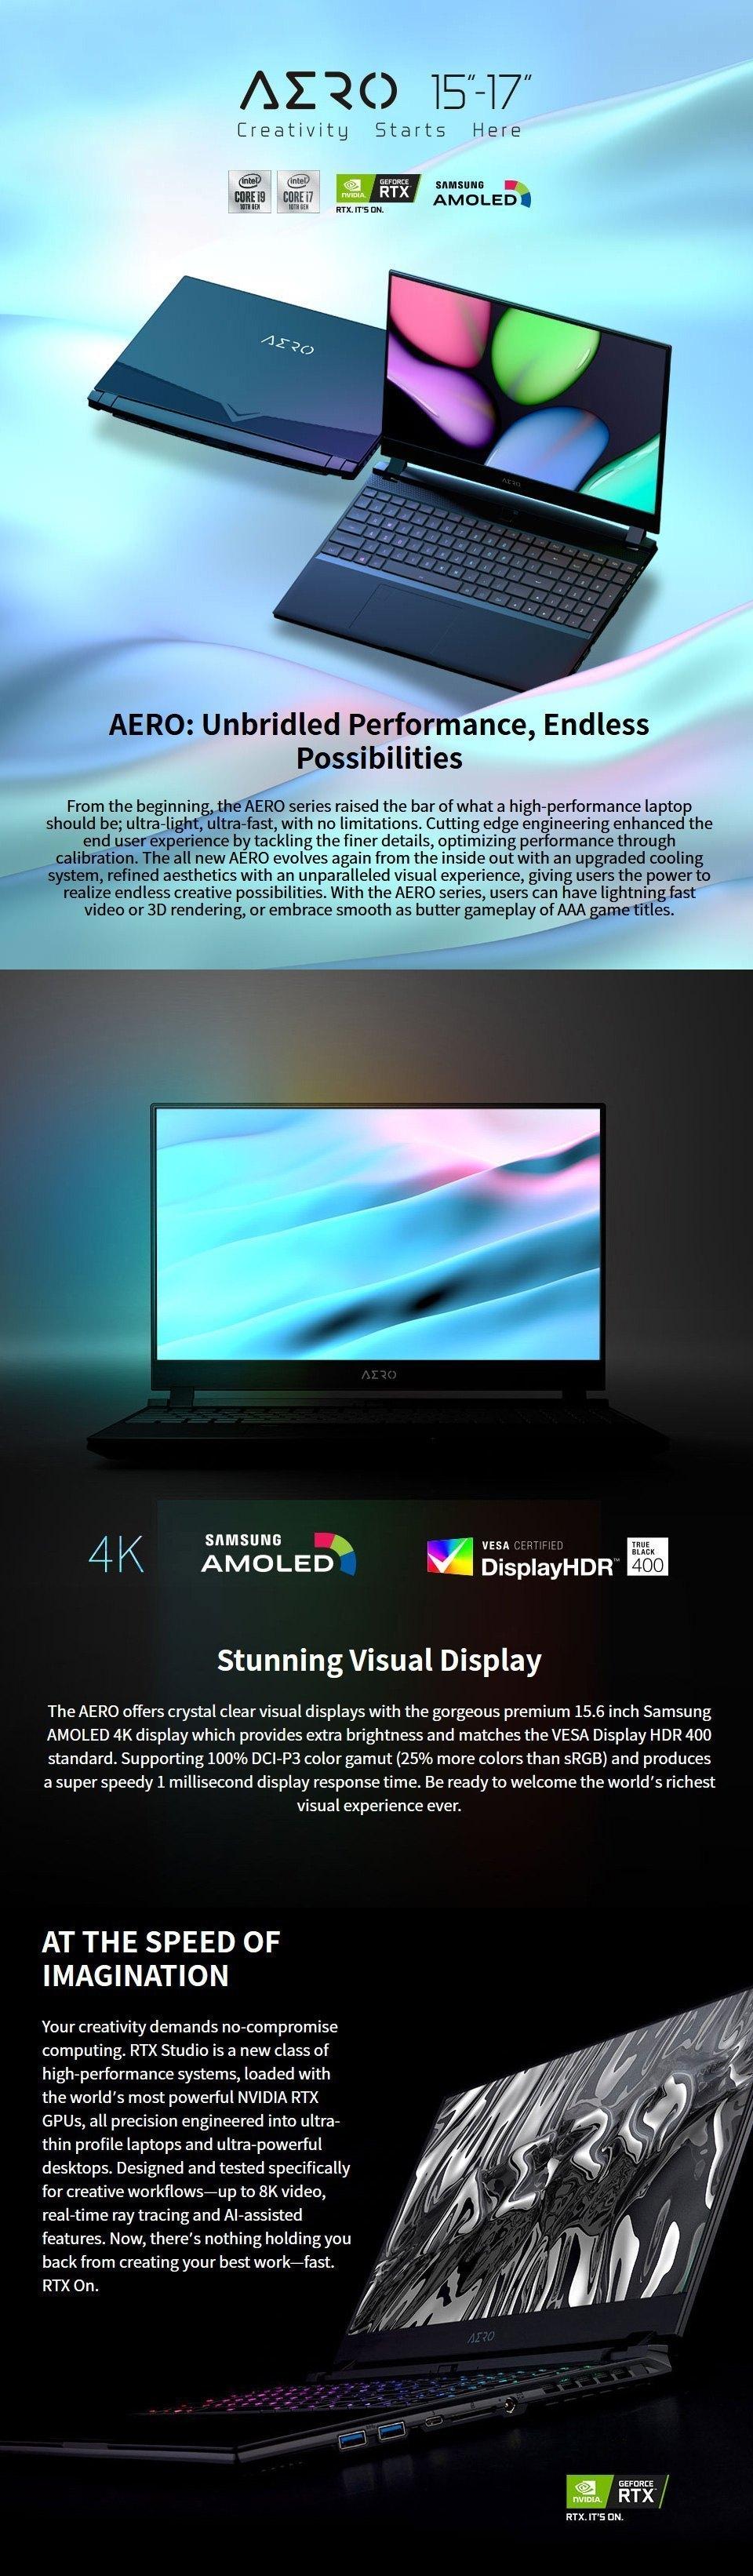 Gigabyte AERO 15 Core i7 RTX 2060 15.6in OLED UHD Laptop features